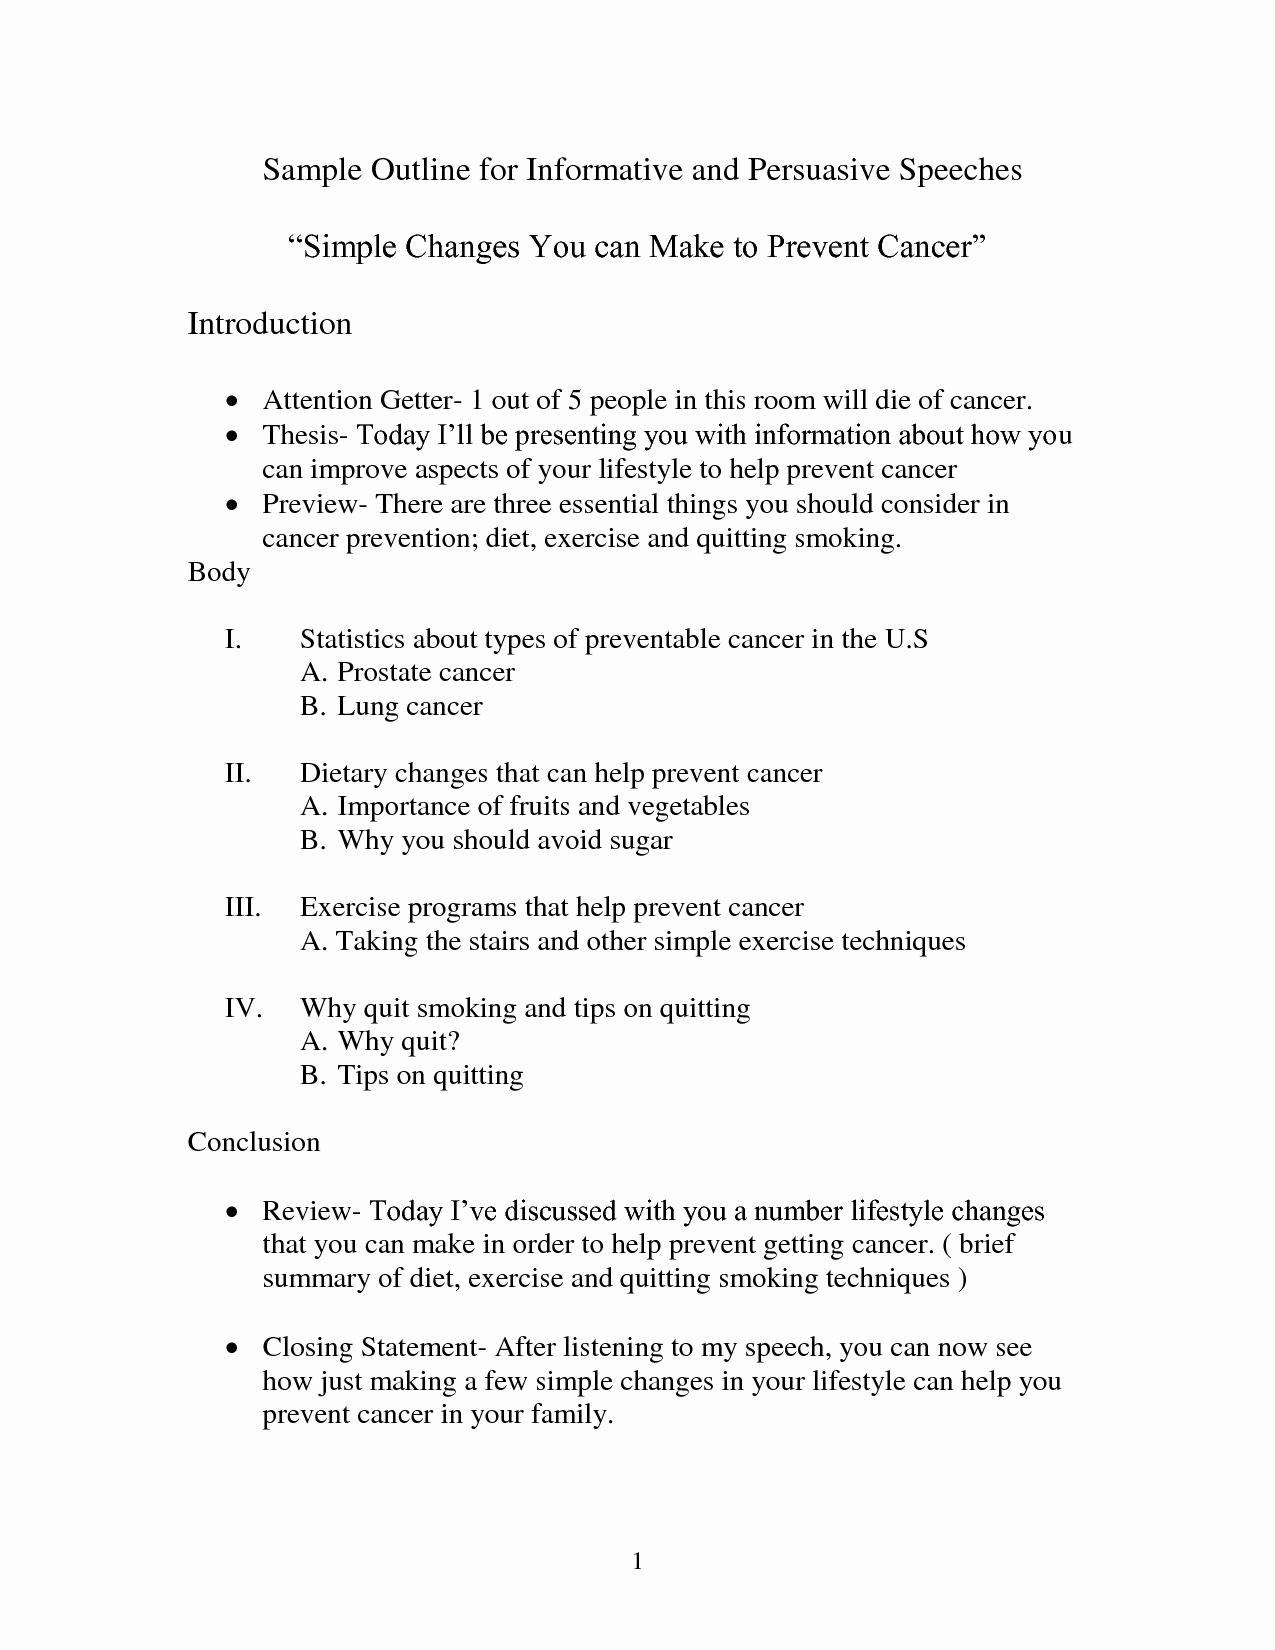 Mla format Outline for Speech Inspirational Best S Of Persuasive Speech Outline form Persuasive